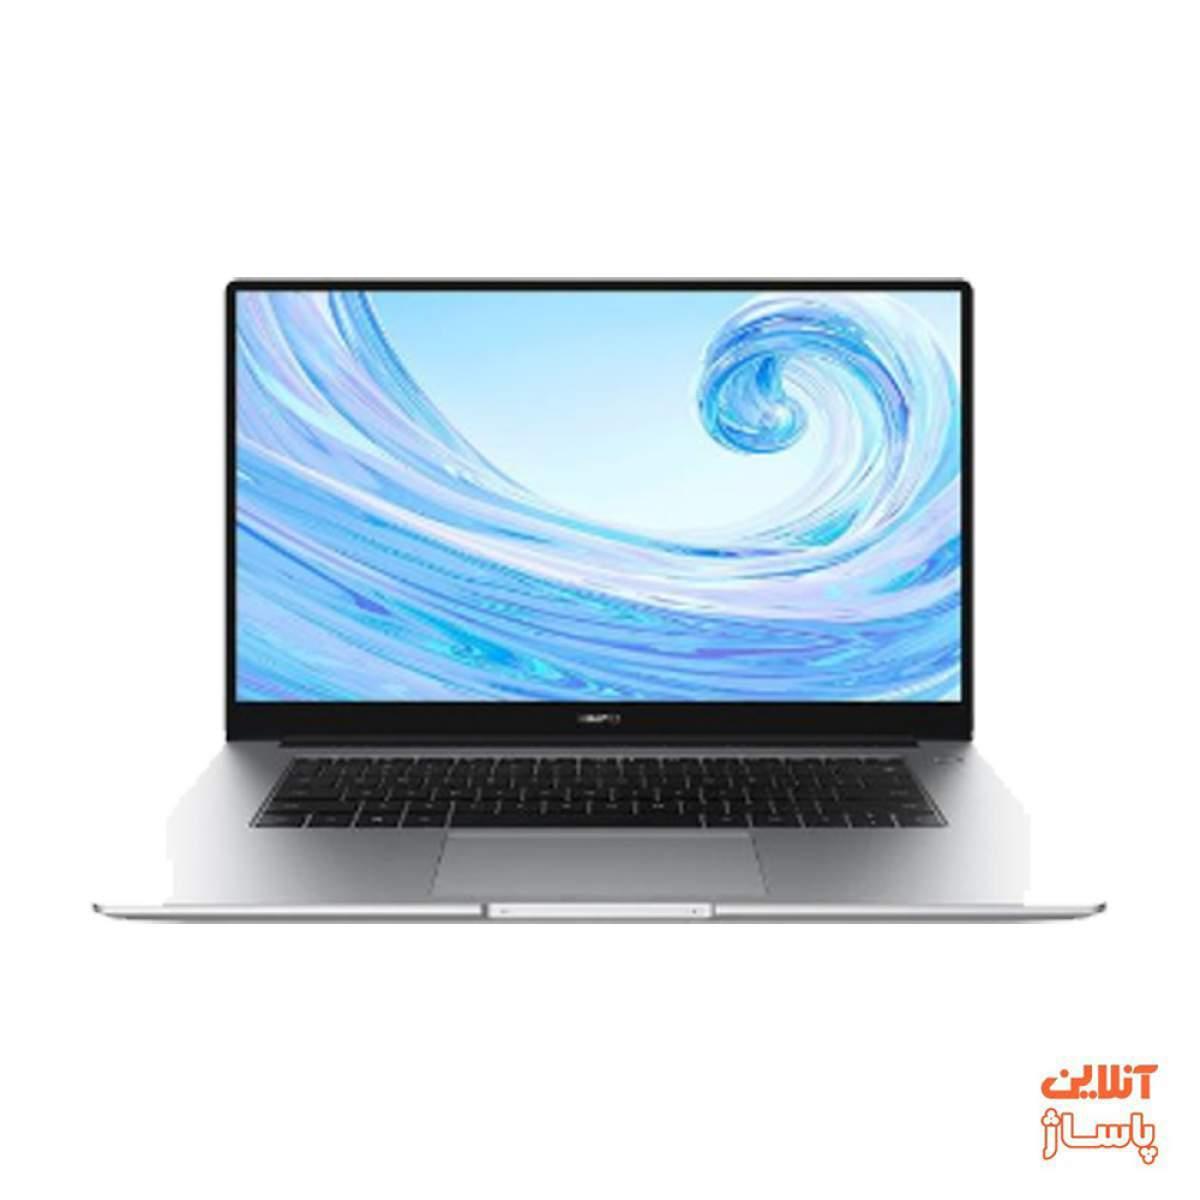 لپ تاپ 15 اینچی هوآوی مدل MateBook D 2020 AMD-B